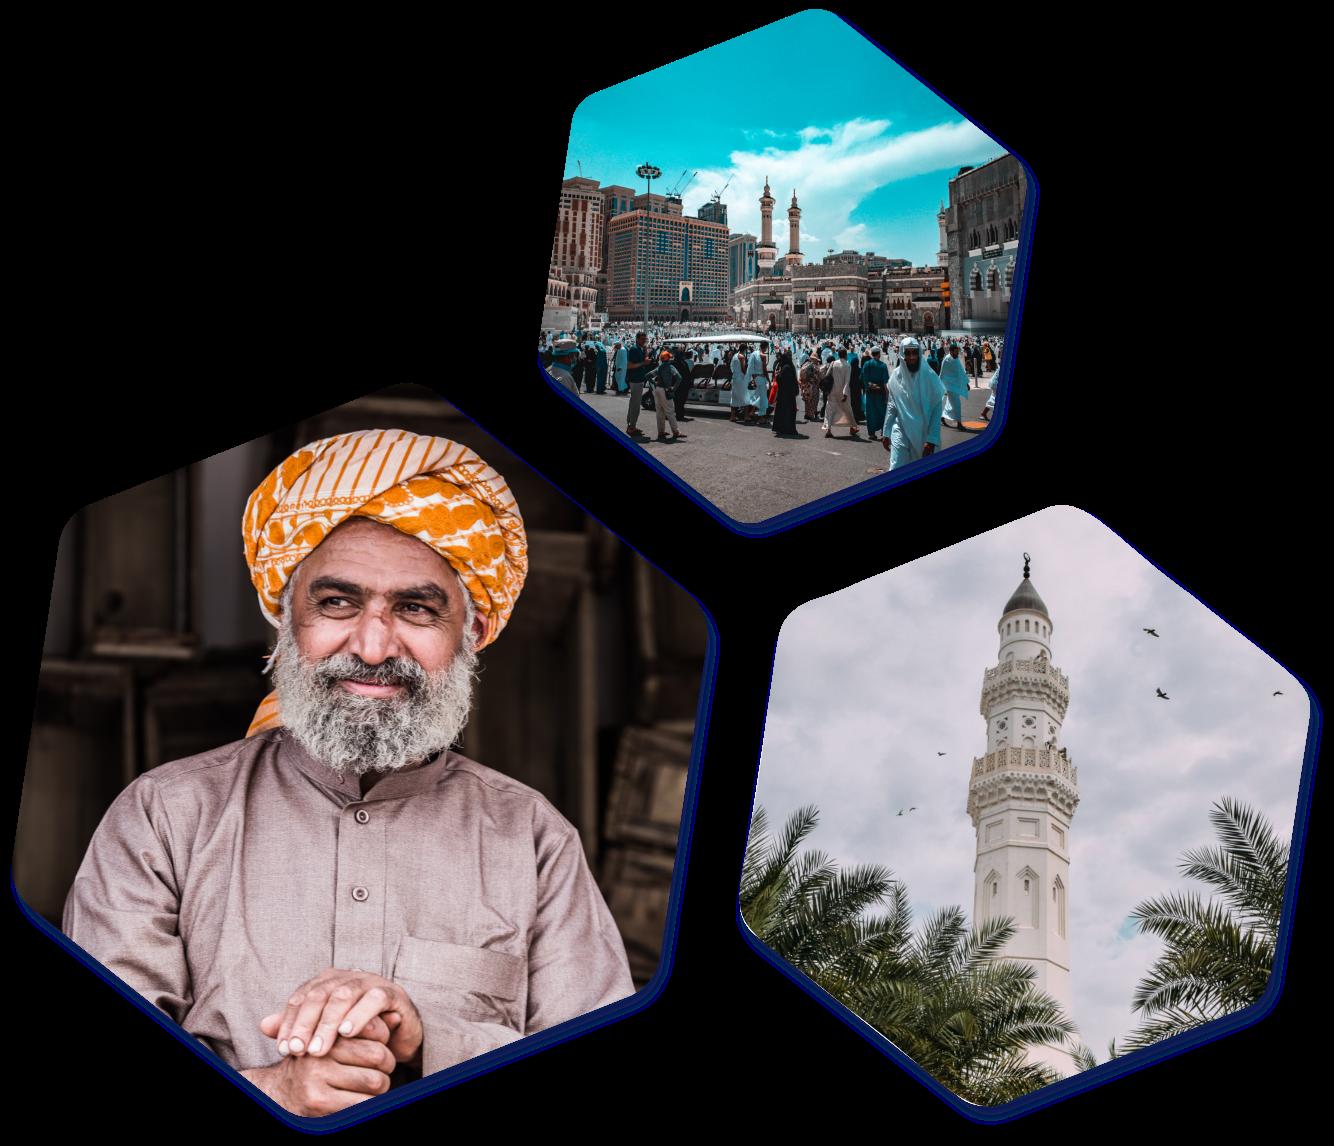 Saudi Arabia Hexagon images